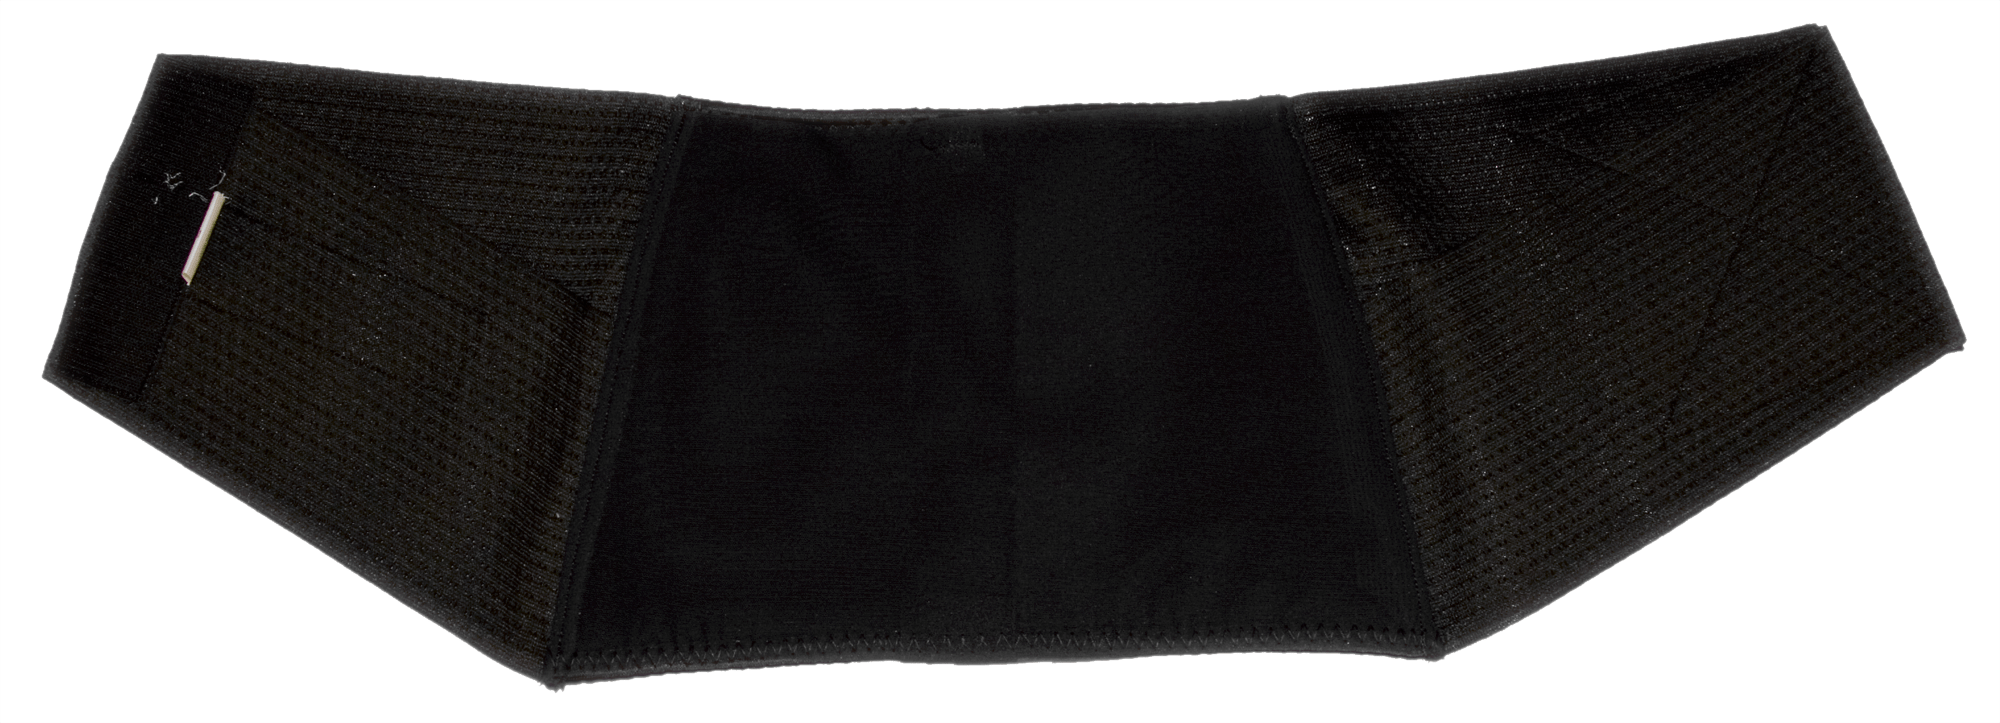 Bunga Braces - Lumbar Support w/Dbl Side Pull